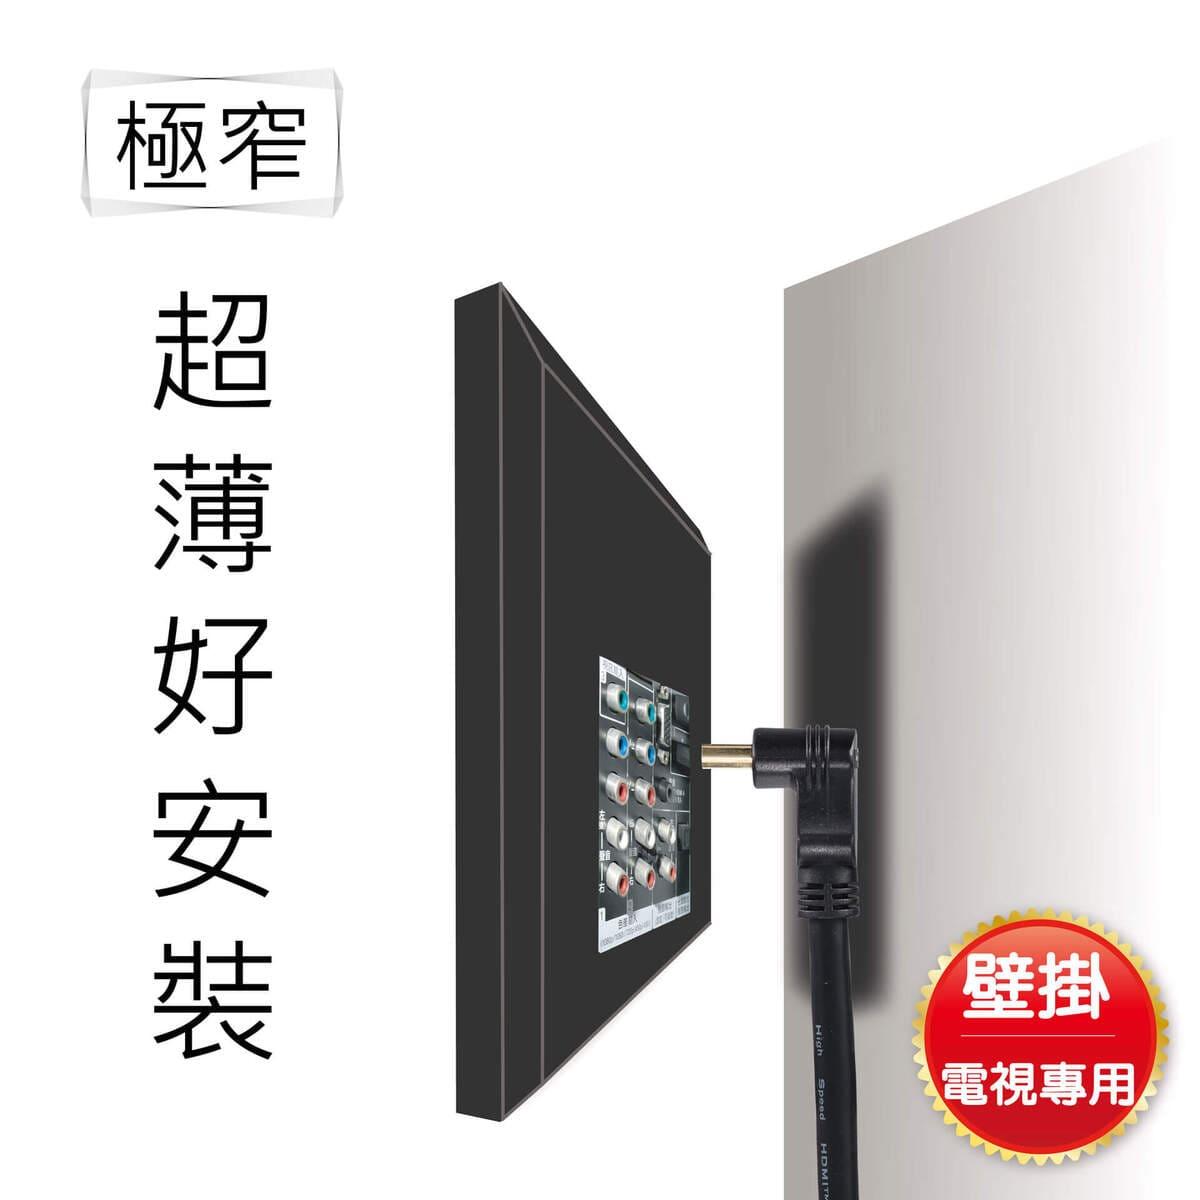 proimages/product/pro-02/pro02-001/HD-3V/HD-3V-3.jpg